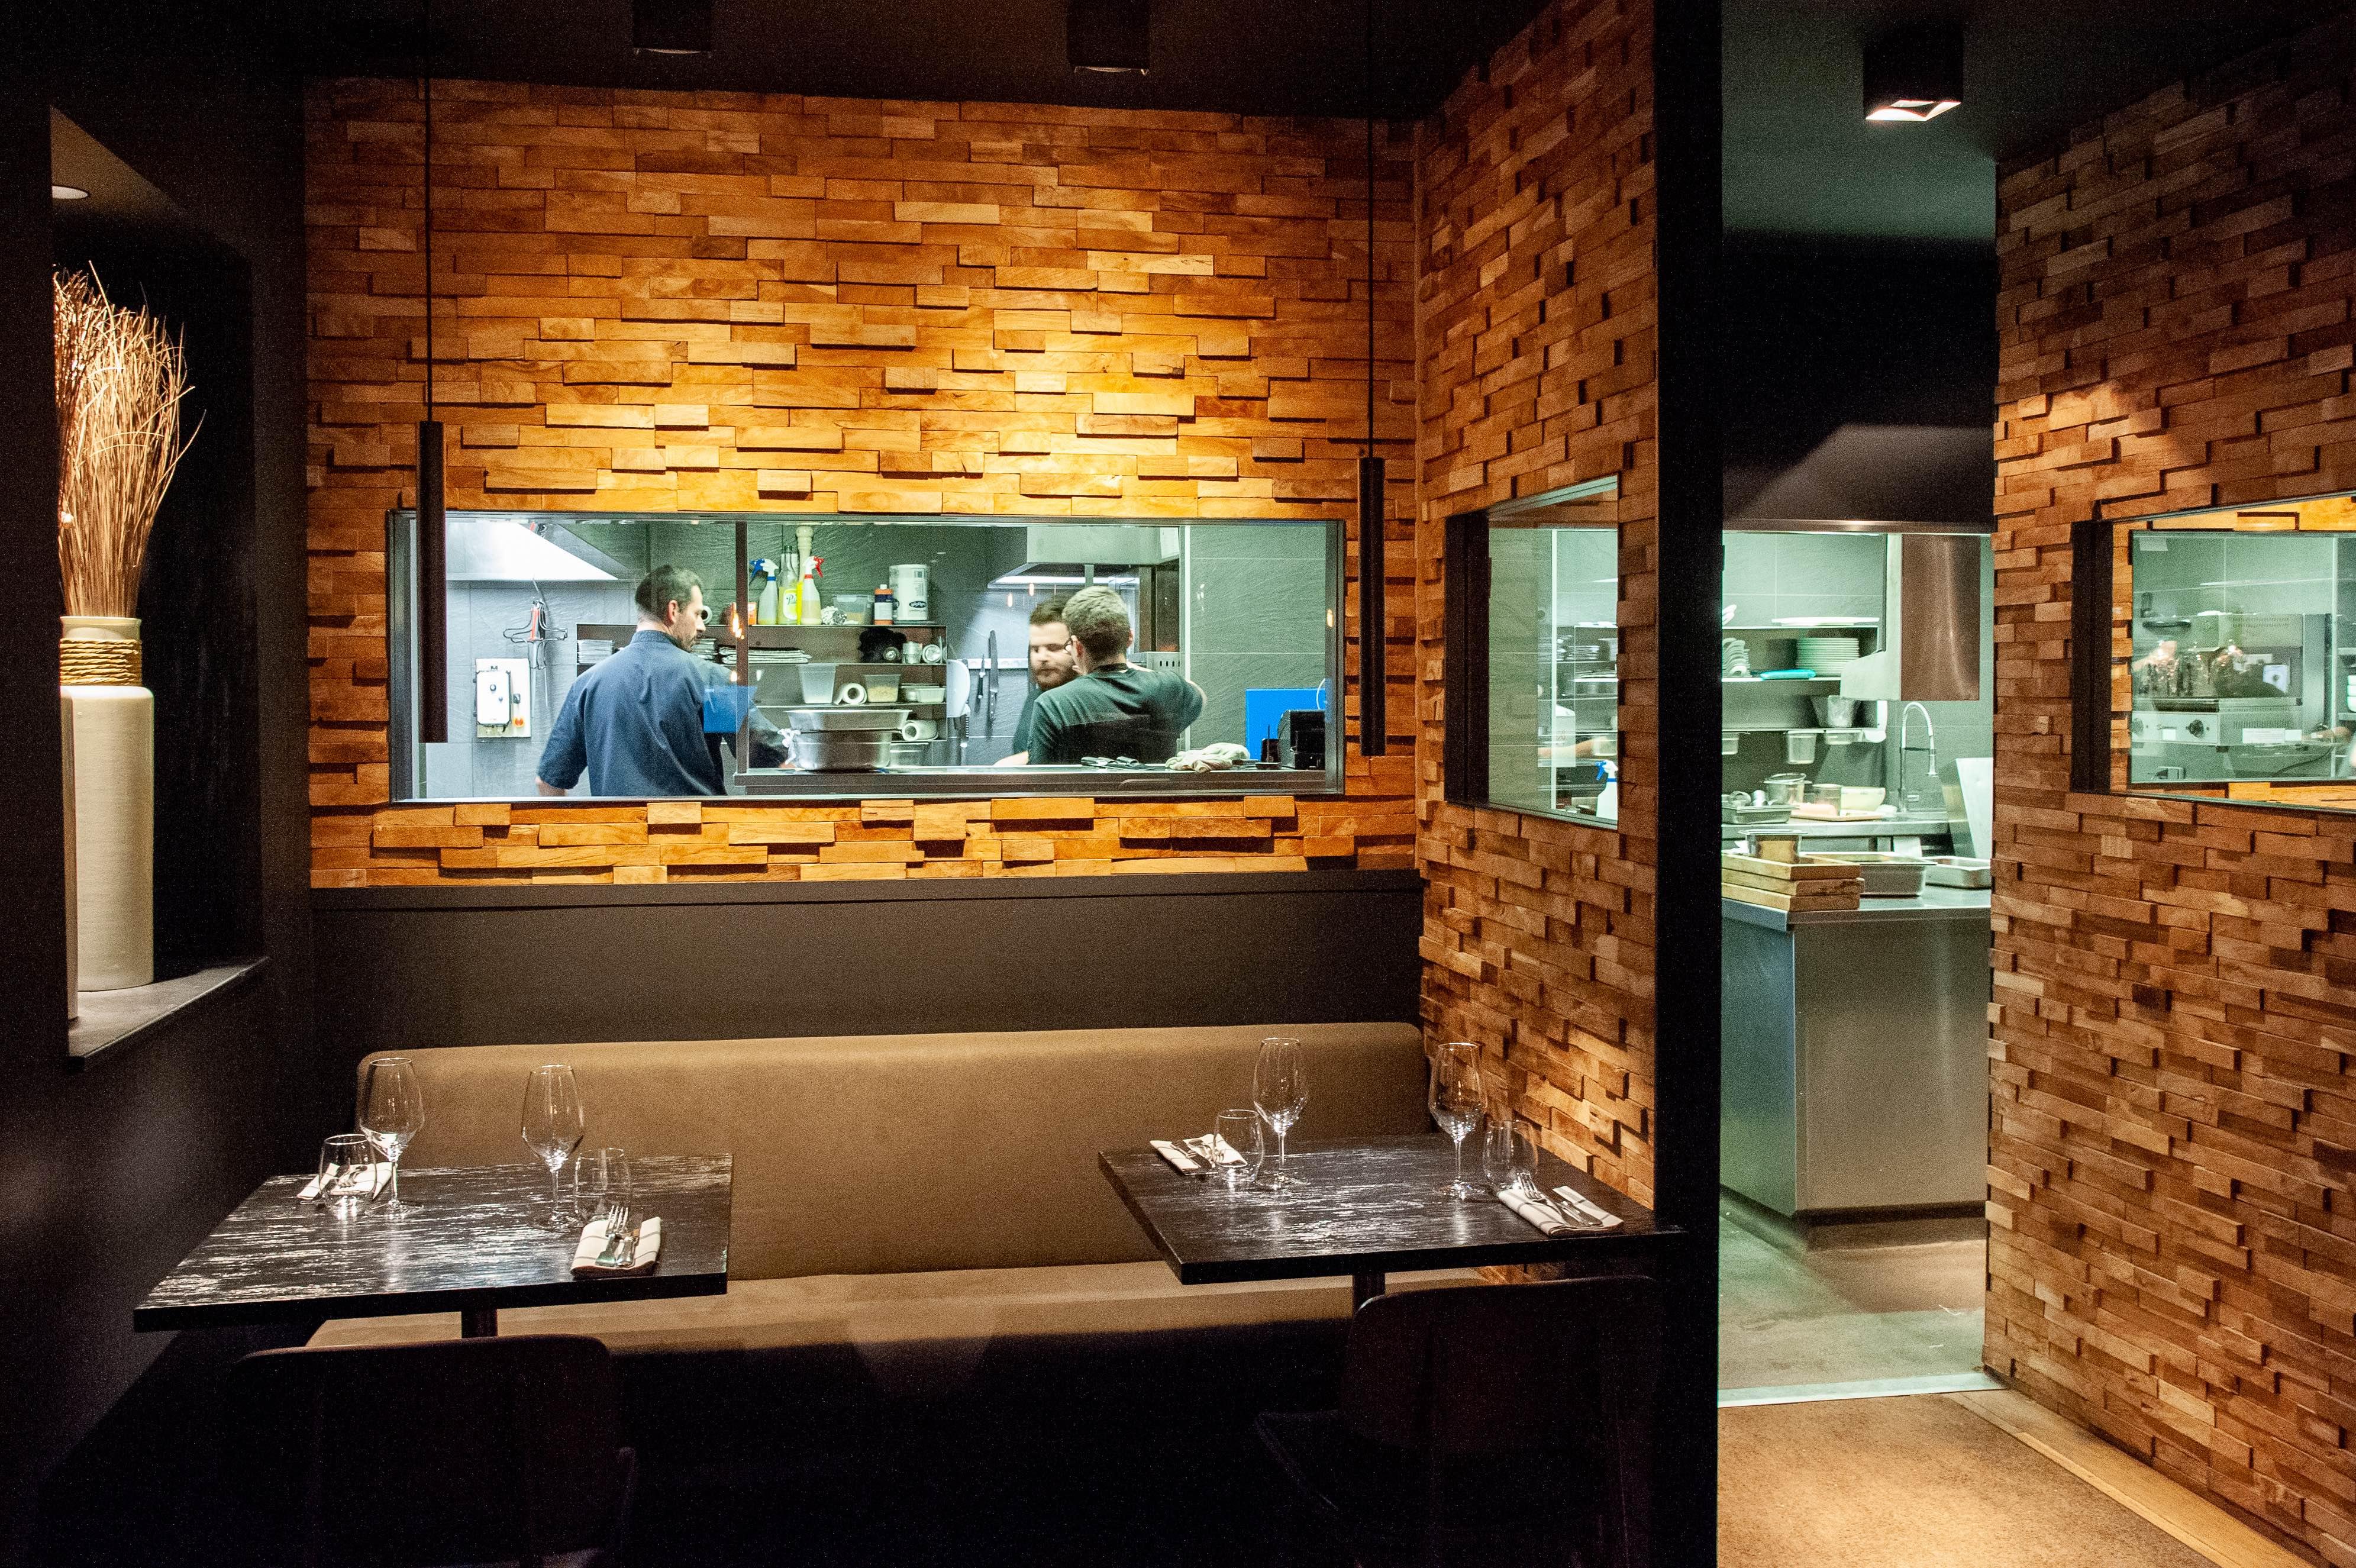 Dîner à l'Epicurien, restaurant d'Albi